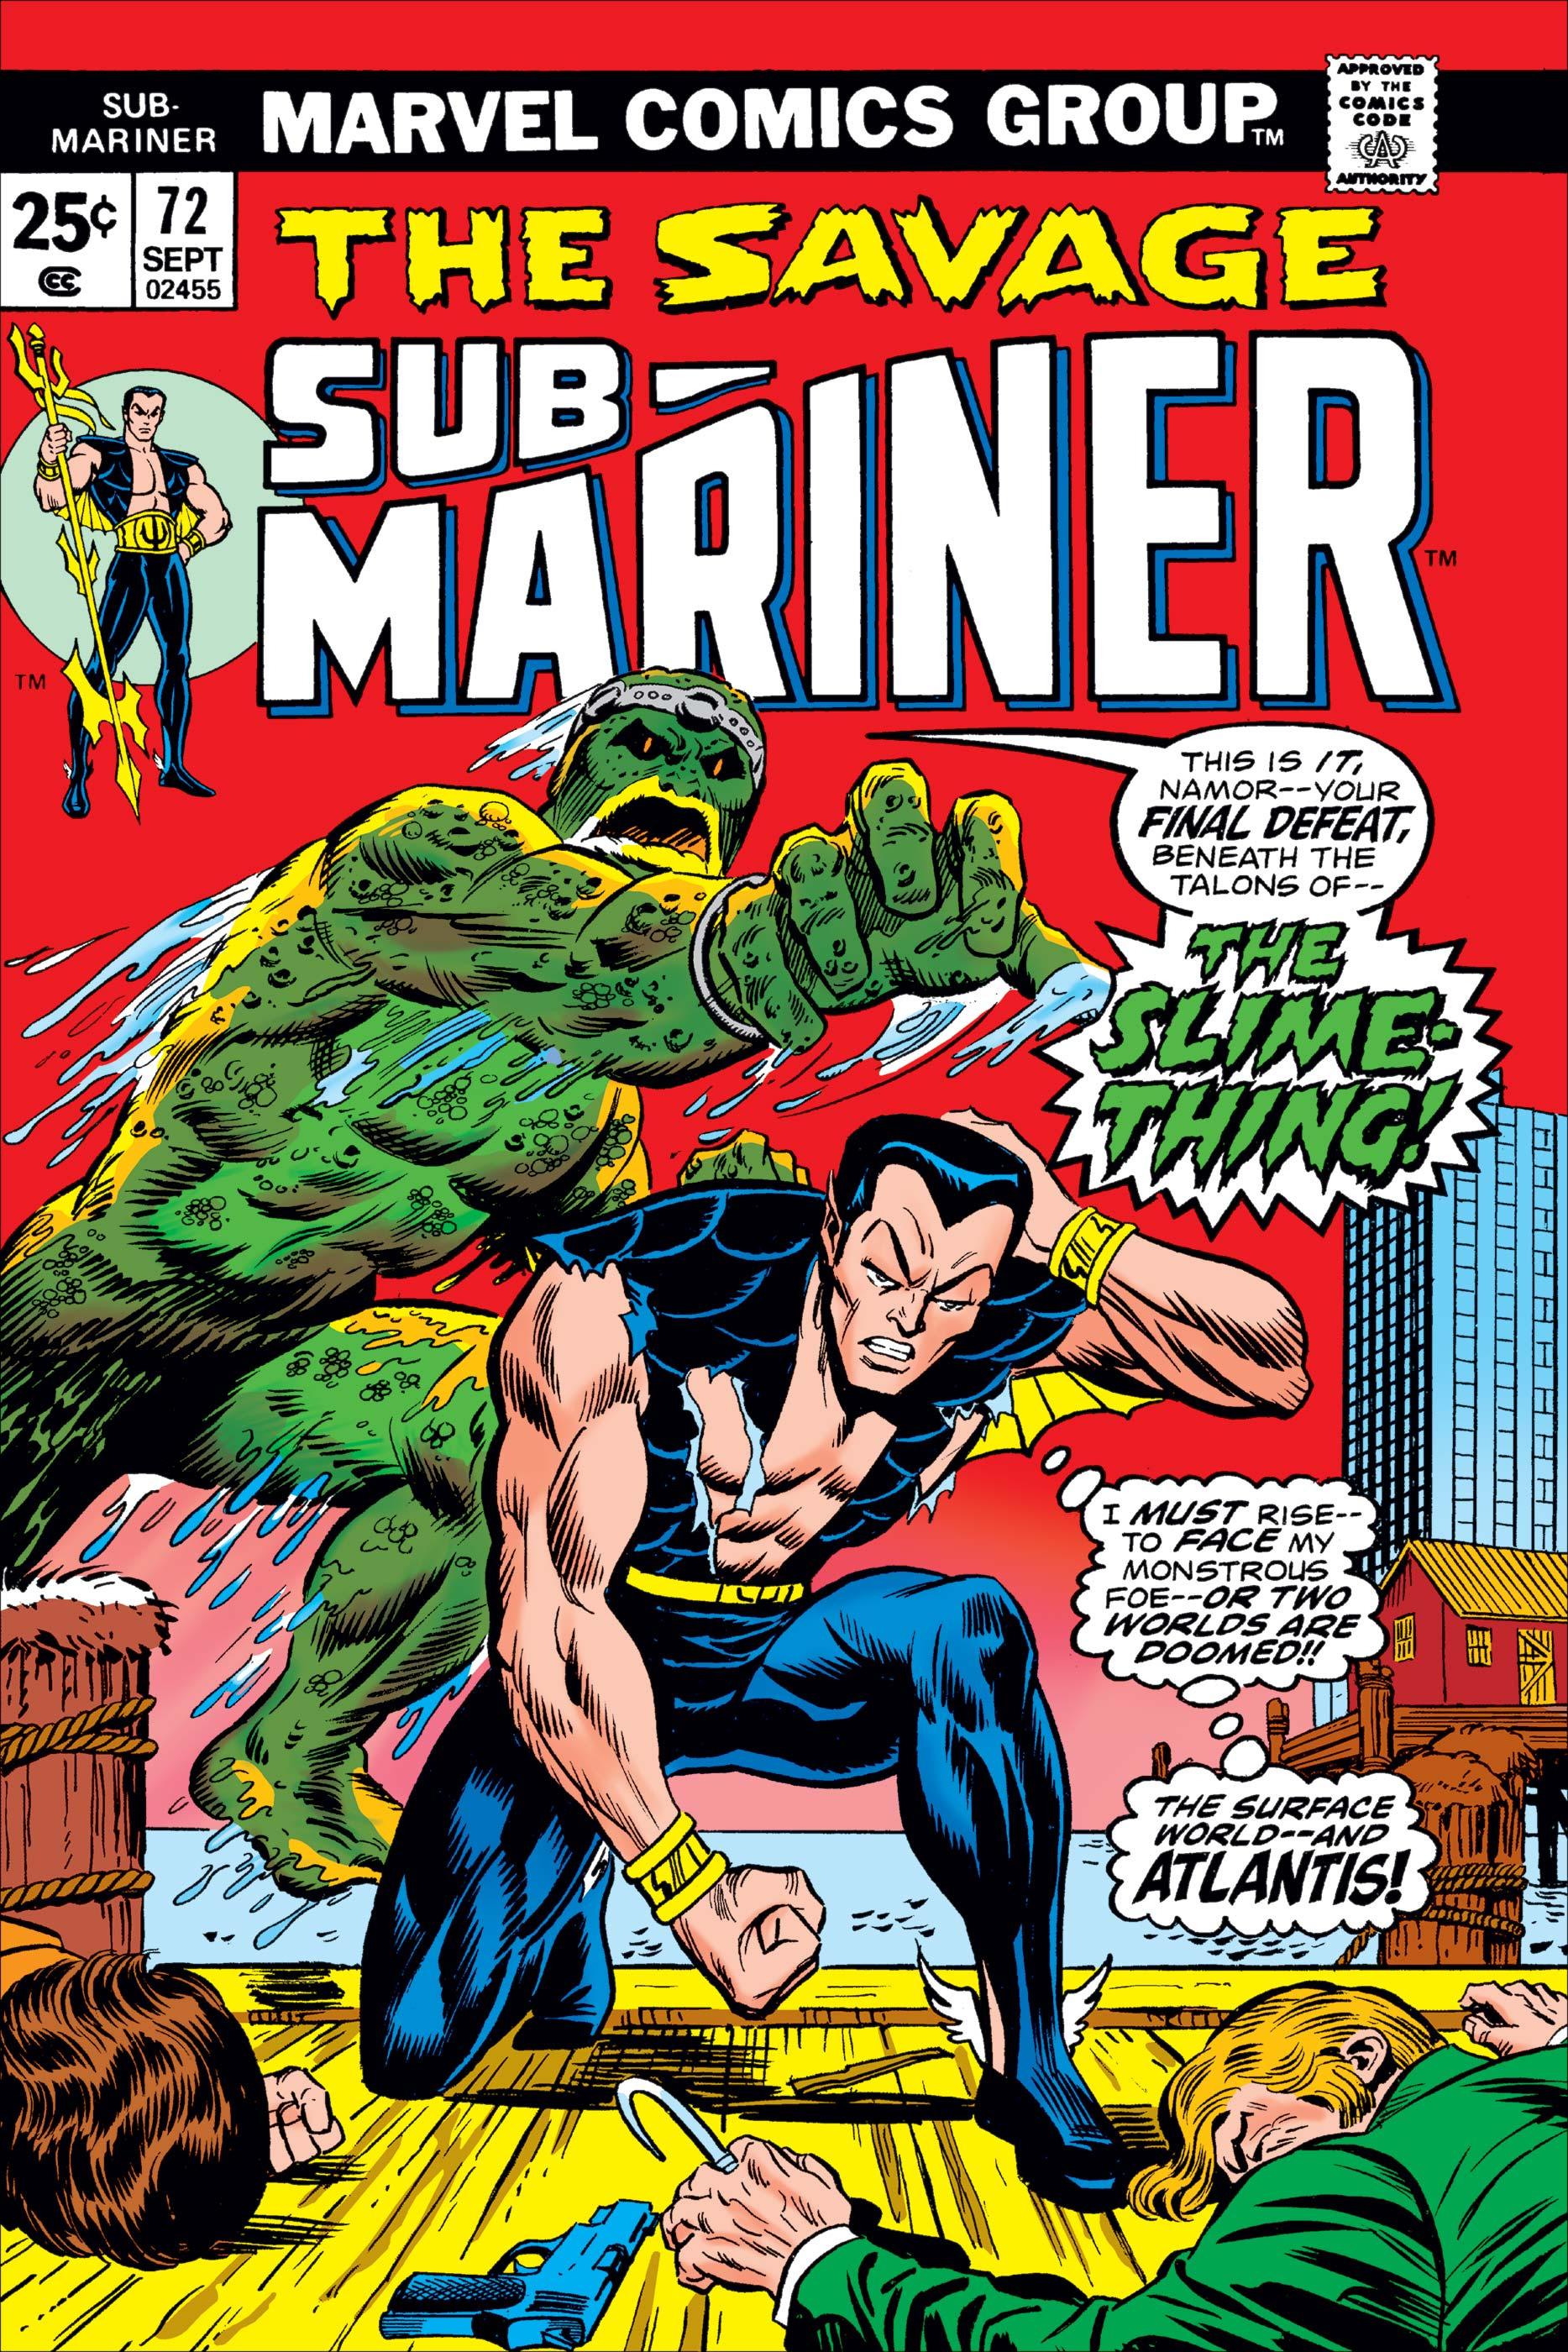 Sub-Mariner (1968) #72